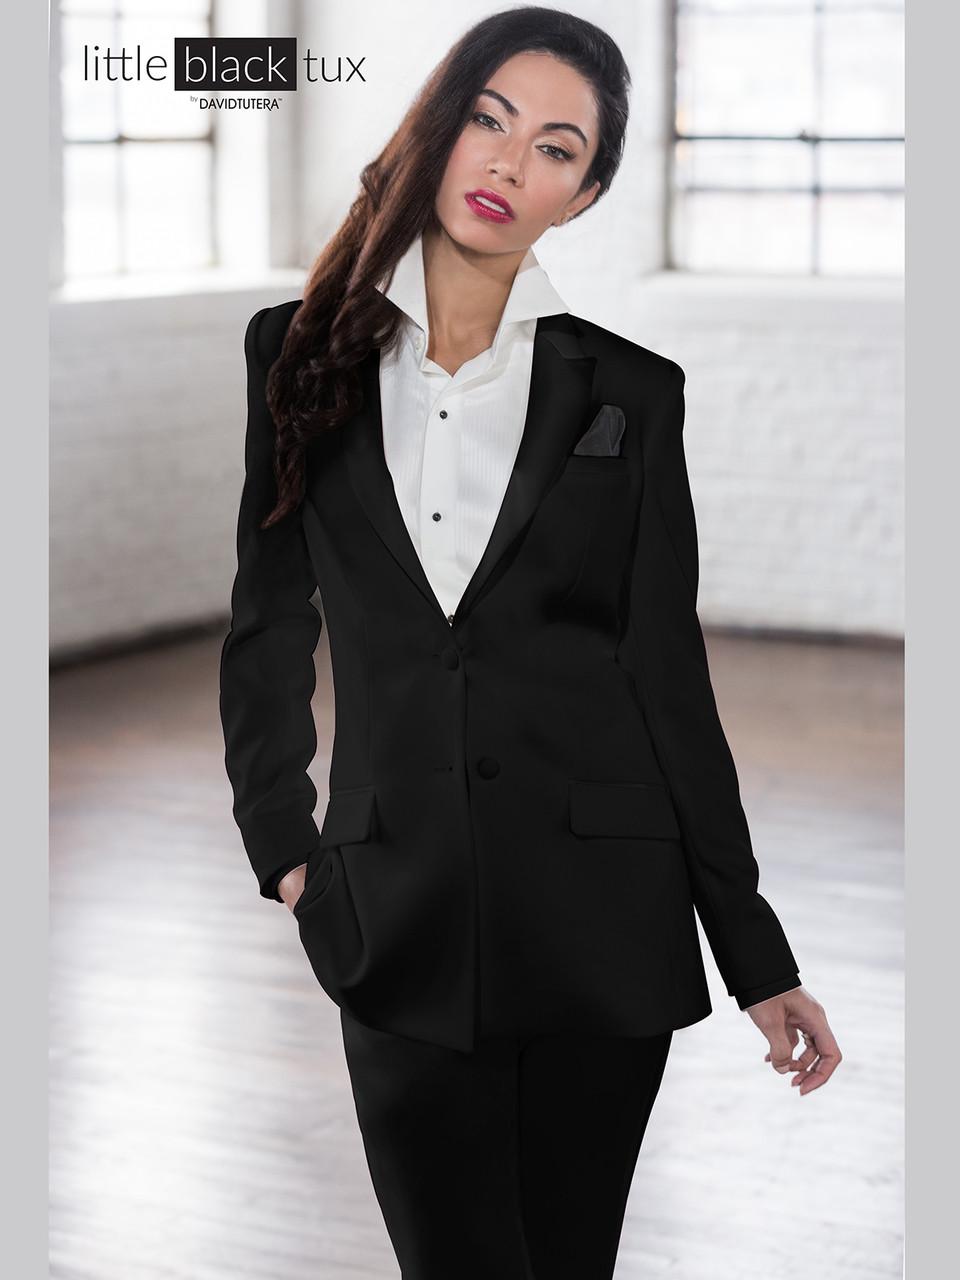 f347152359 Black satin peak lapel tuxedo suit jacket for women